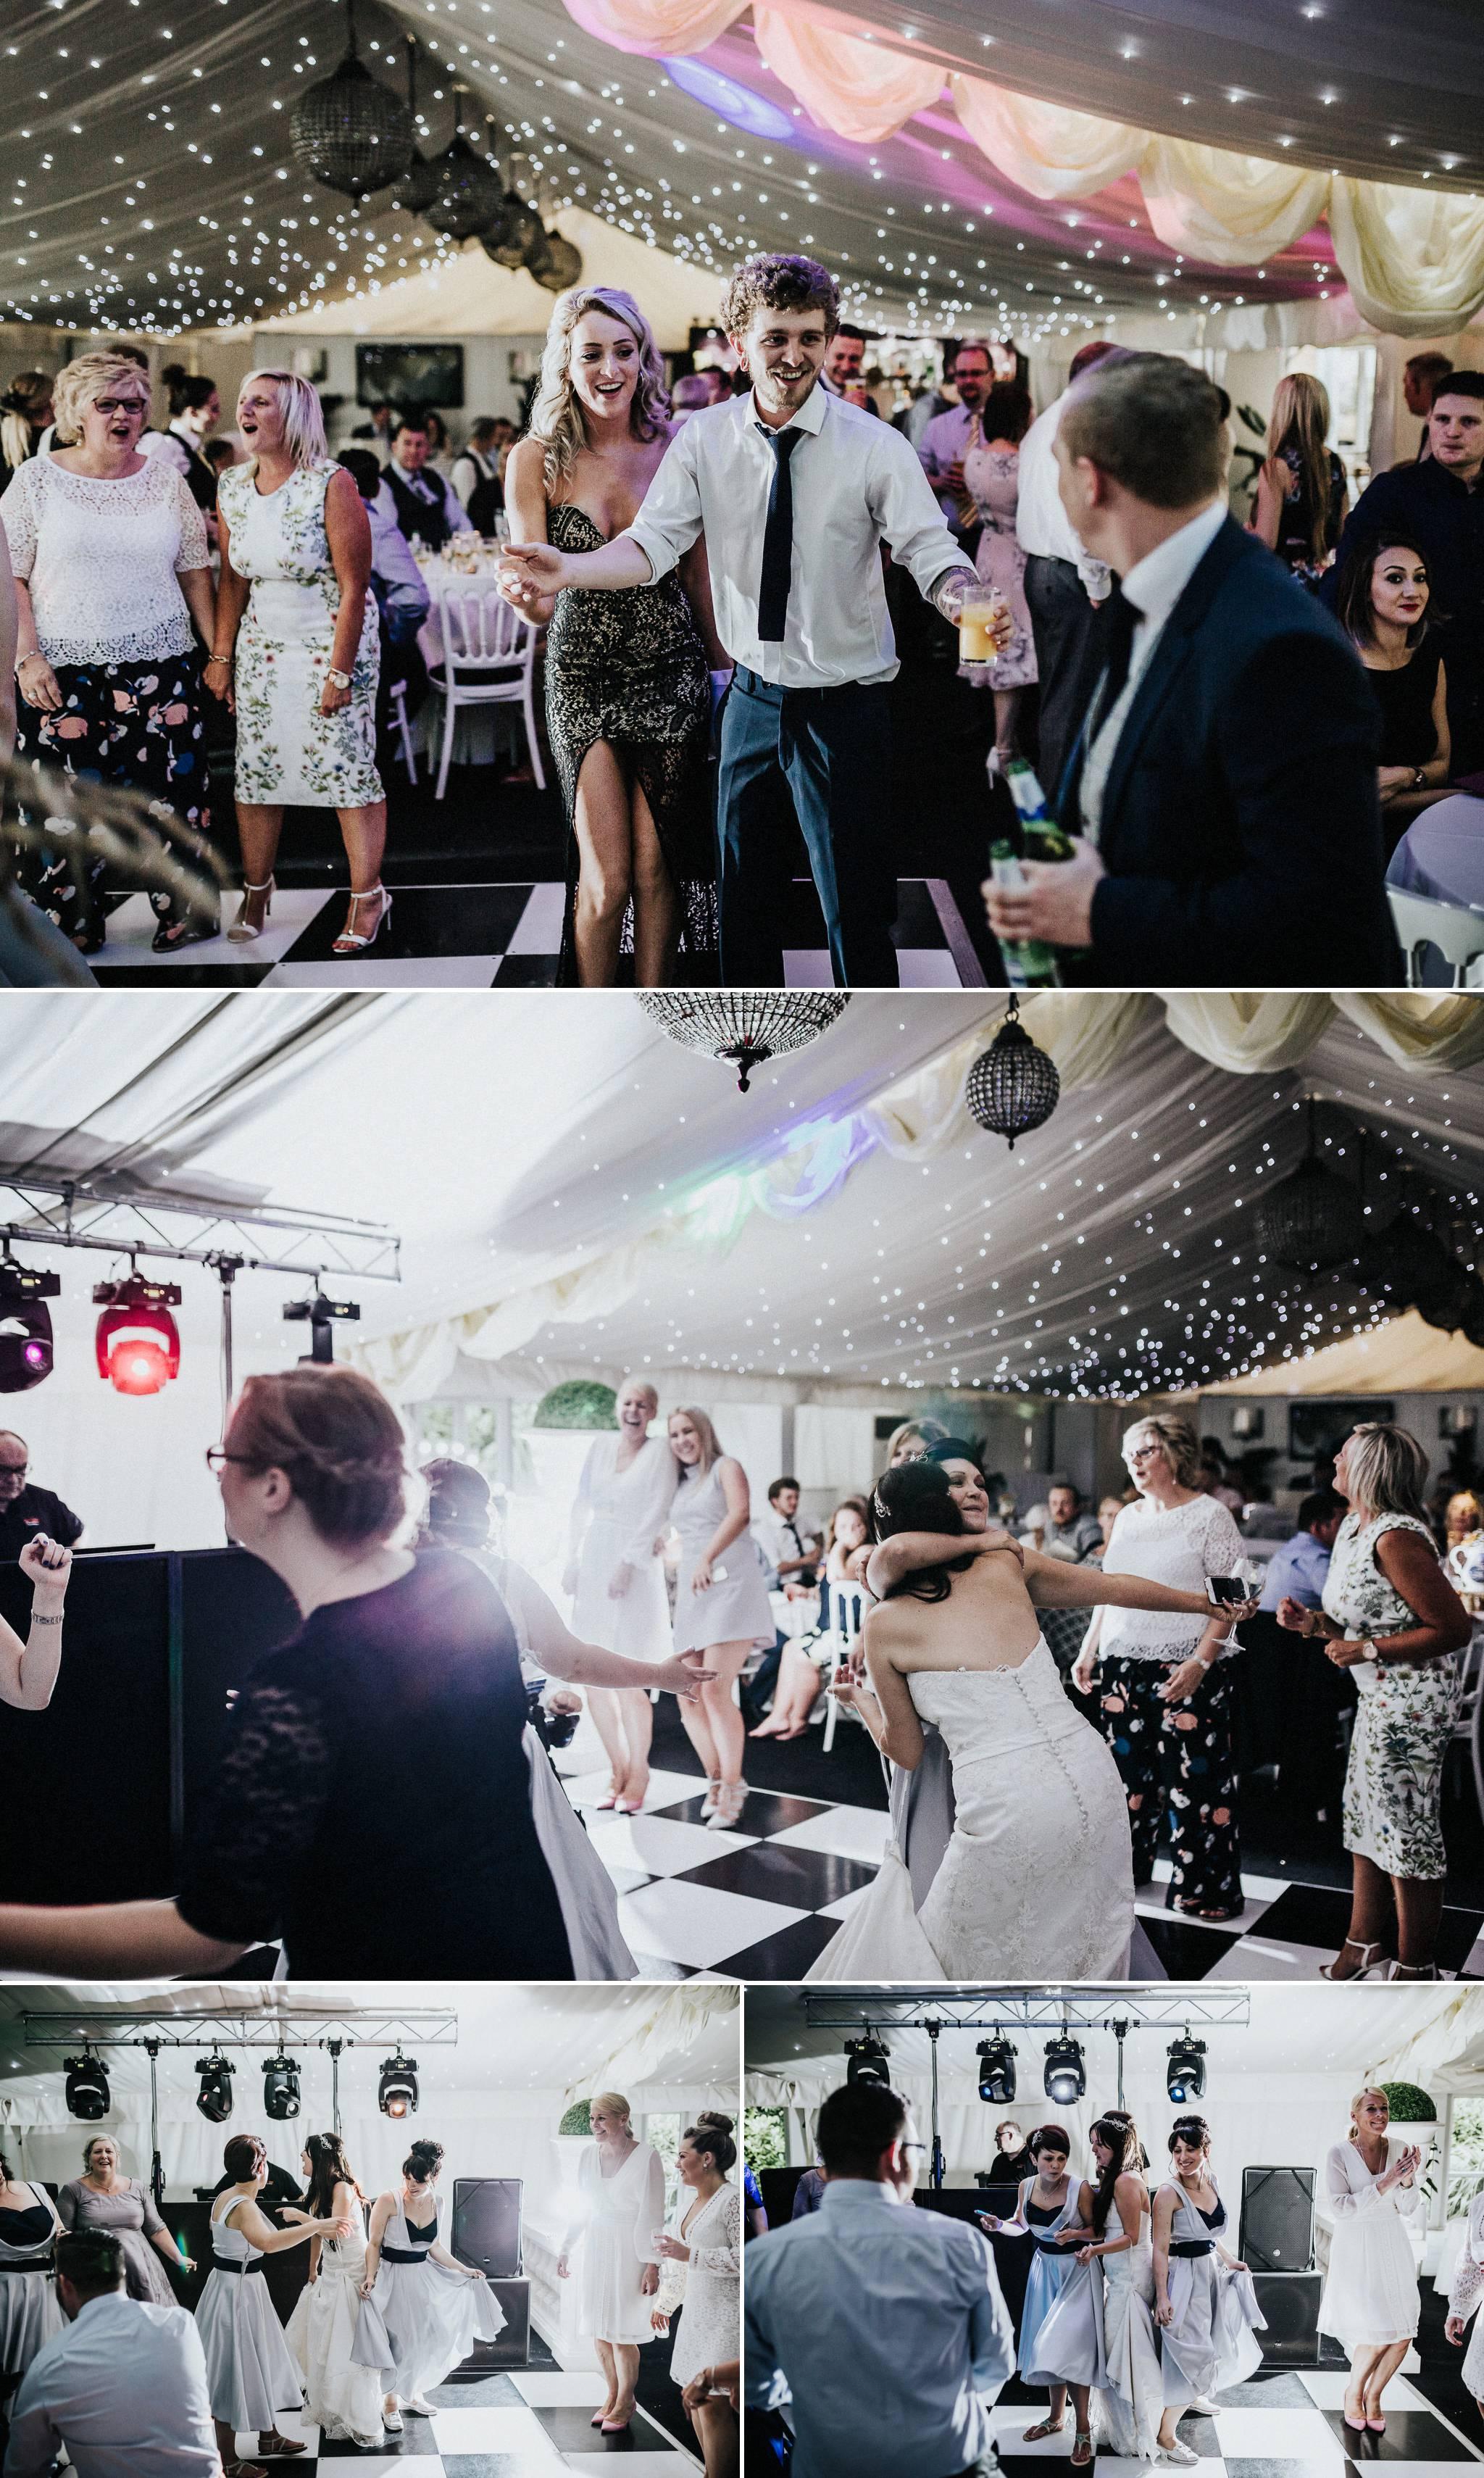 moxhull-hall-wedding-photography 23.jpg